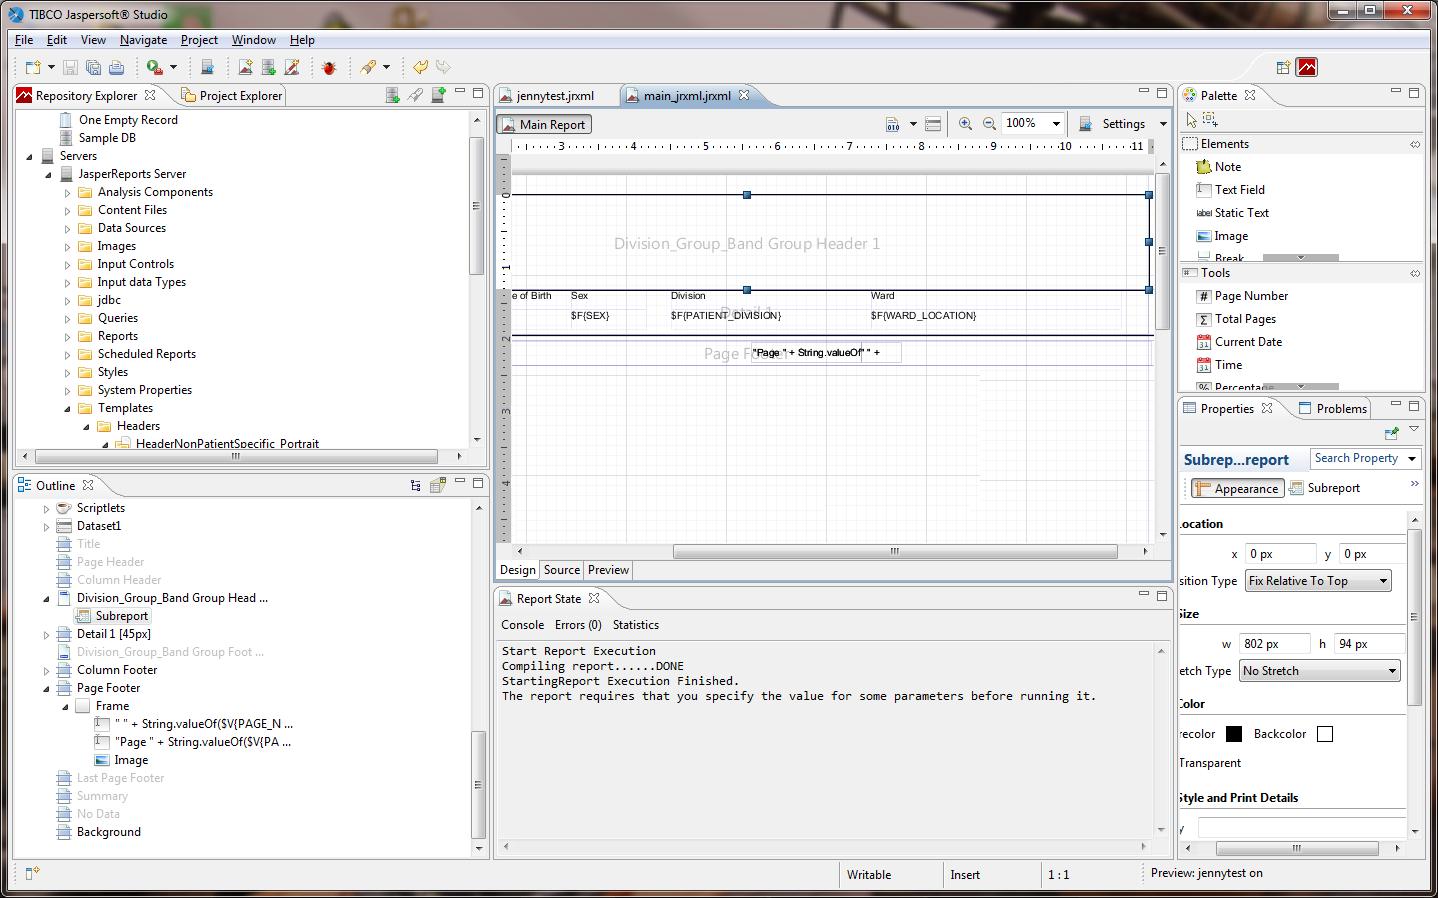 Screen shot of the JasperSoft Studio report development application.